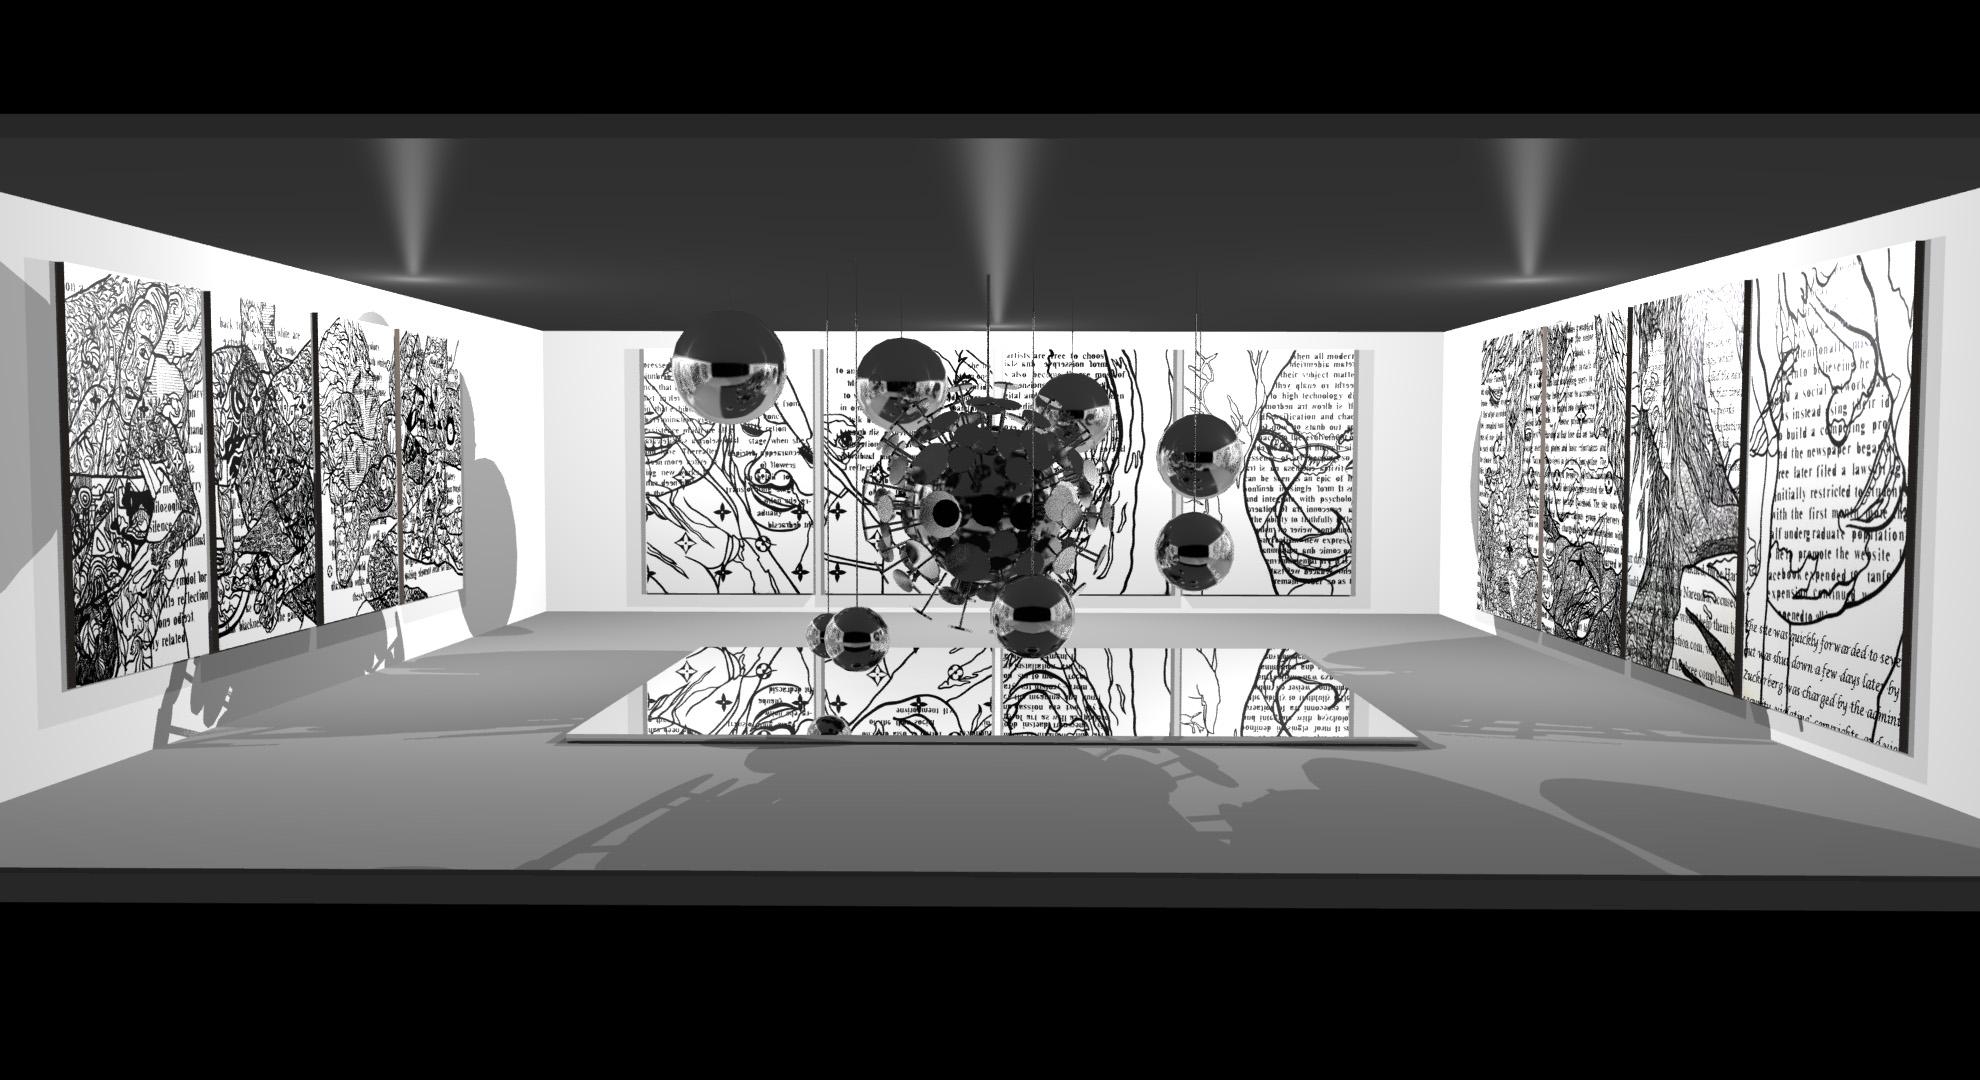 D Rendering Exhibition : Art exhibition render by veskis on deviantart